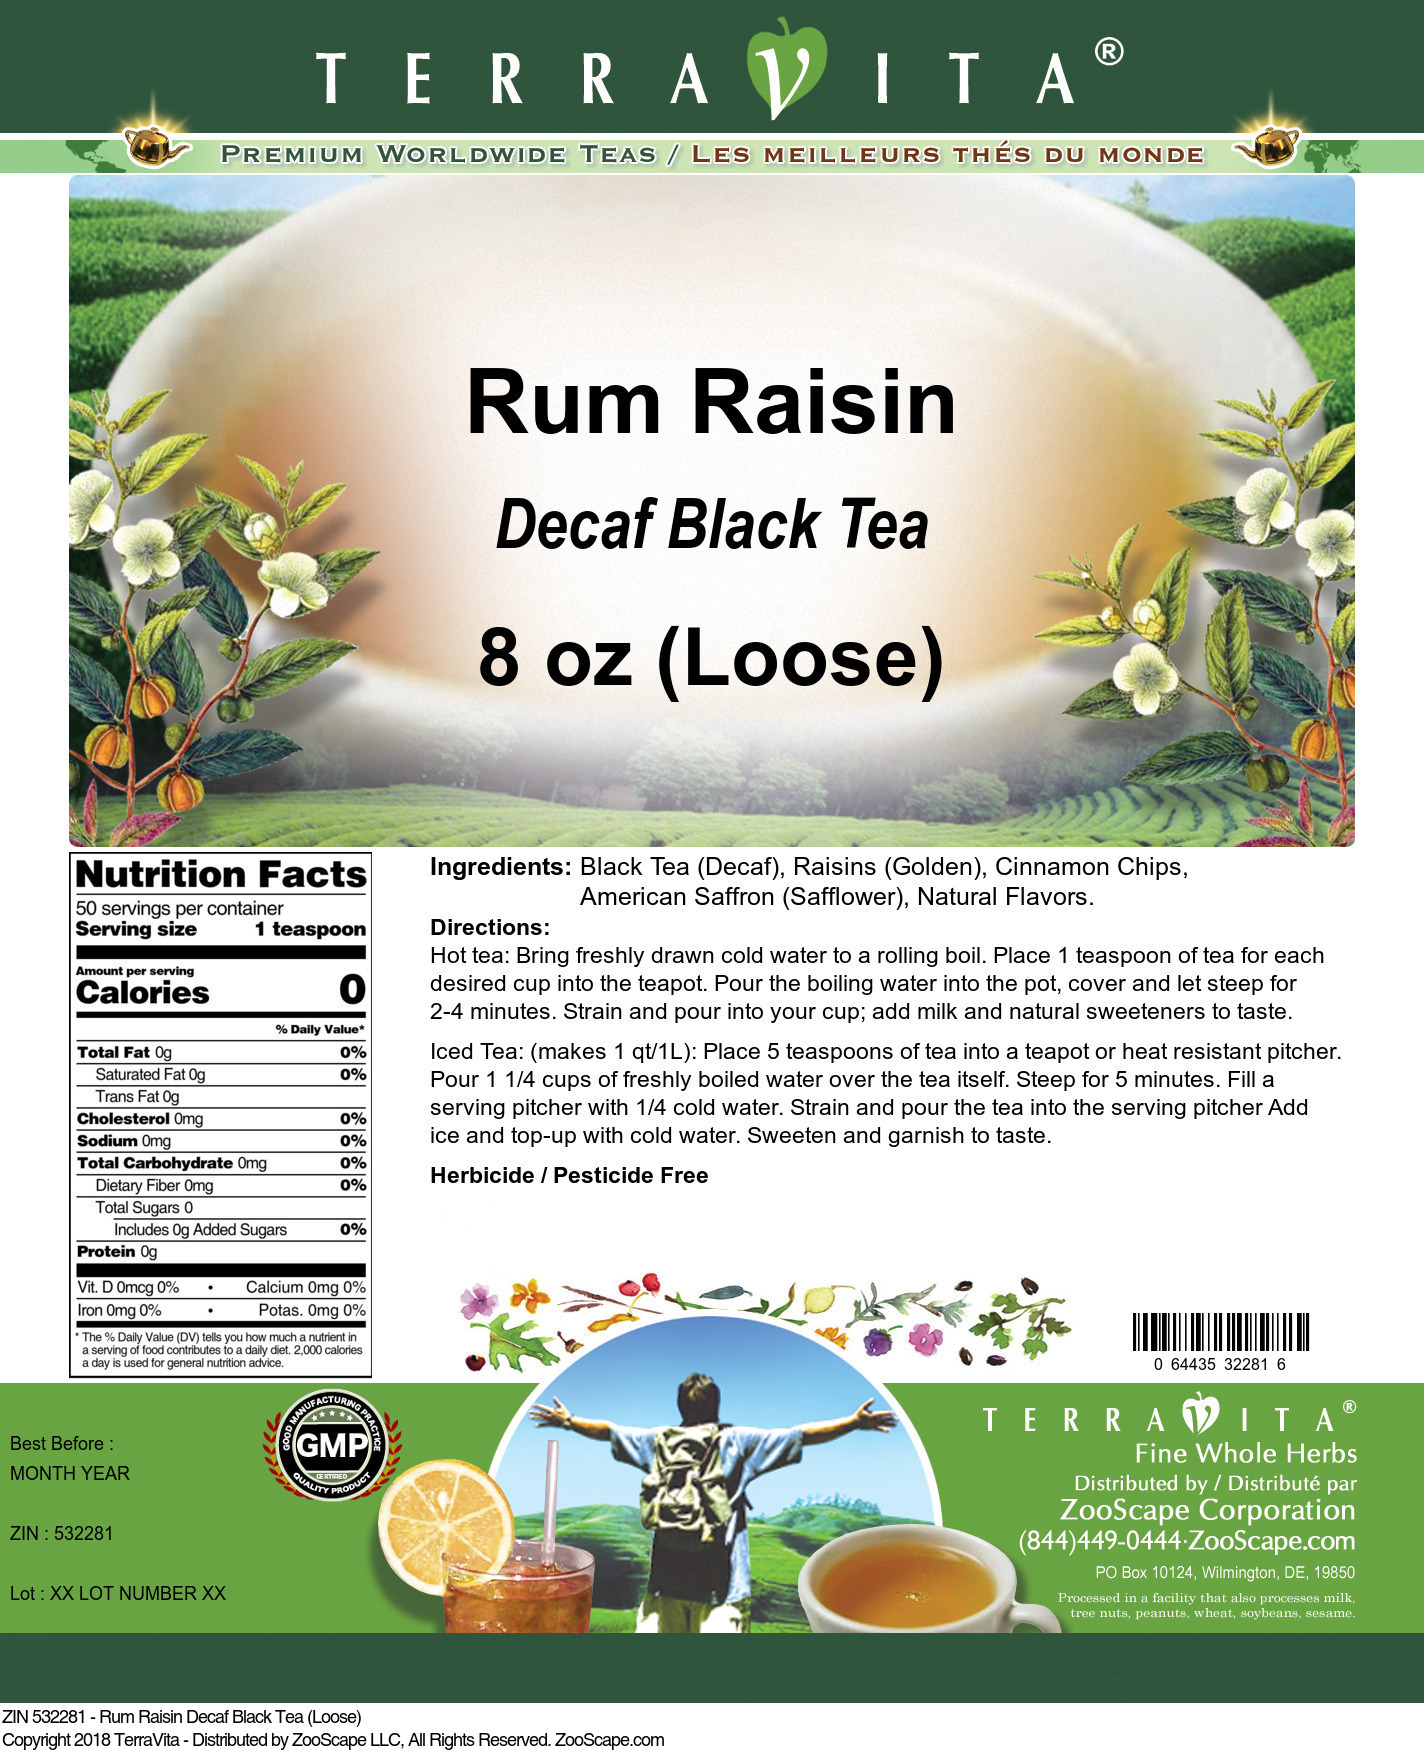 Rum Raisin Decaf Black Tea (Loose)